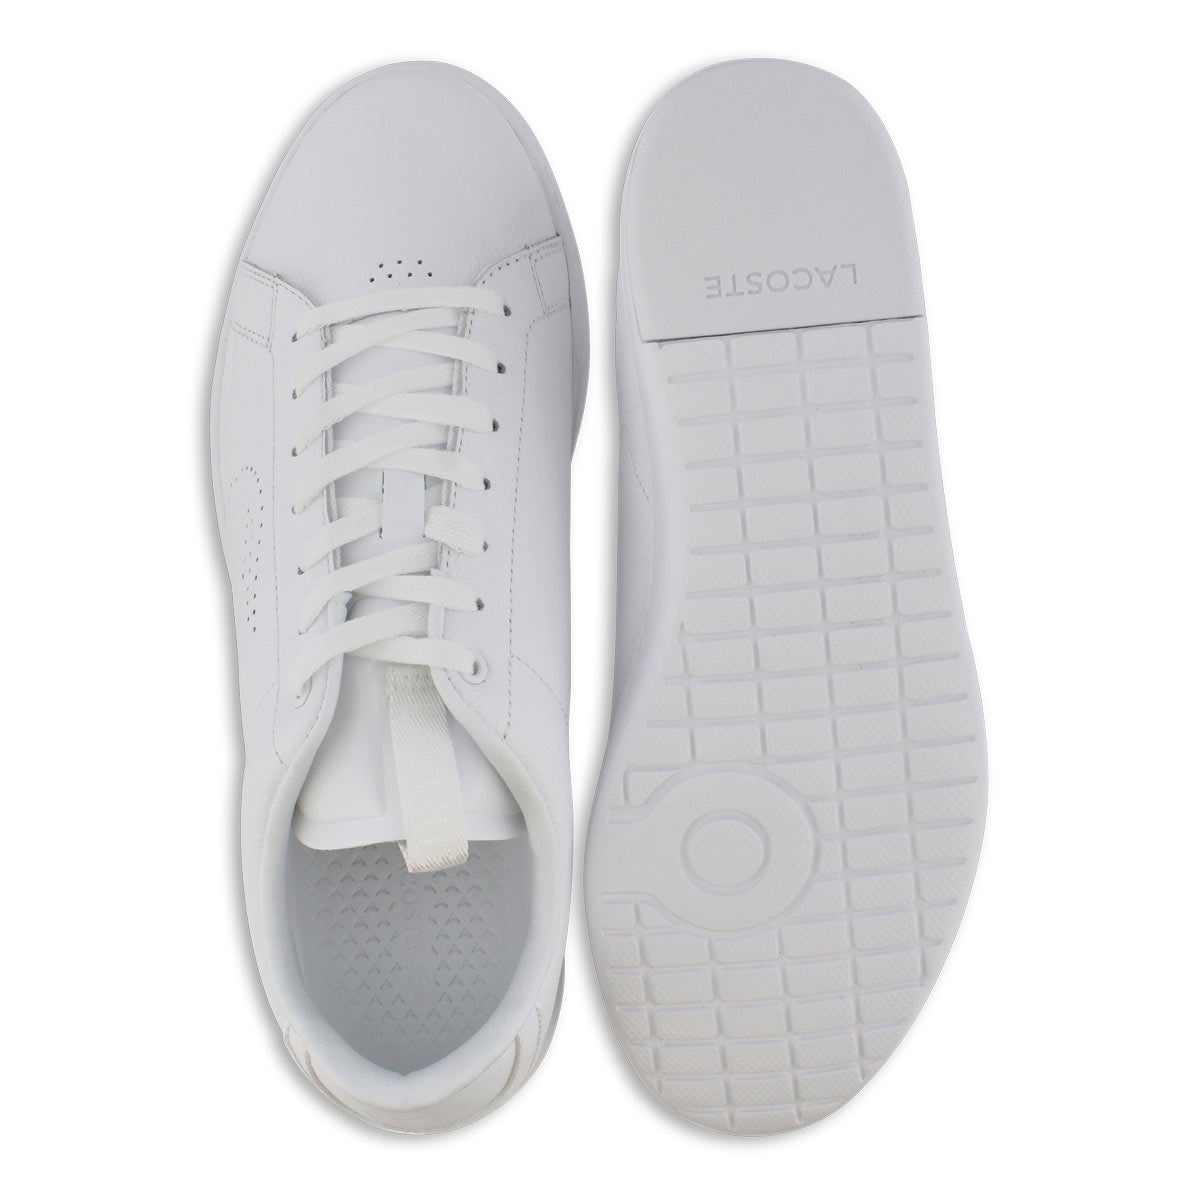 Mns Carnaby EVO 319 1 white fashion snkr